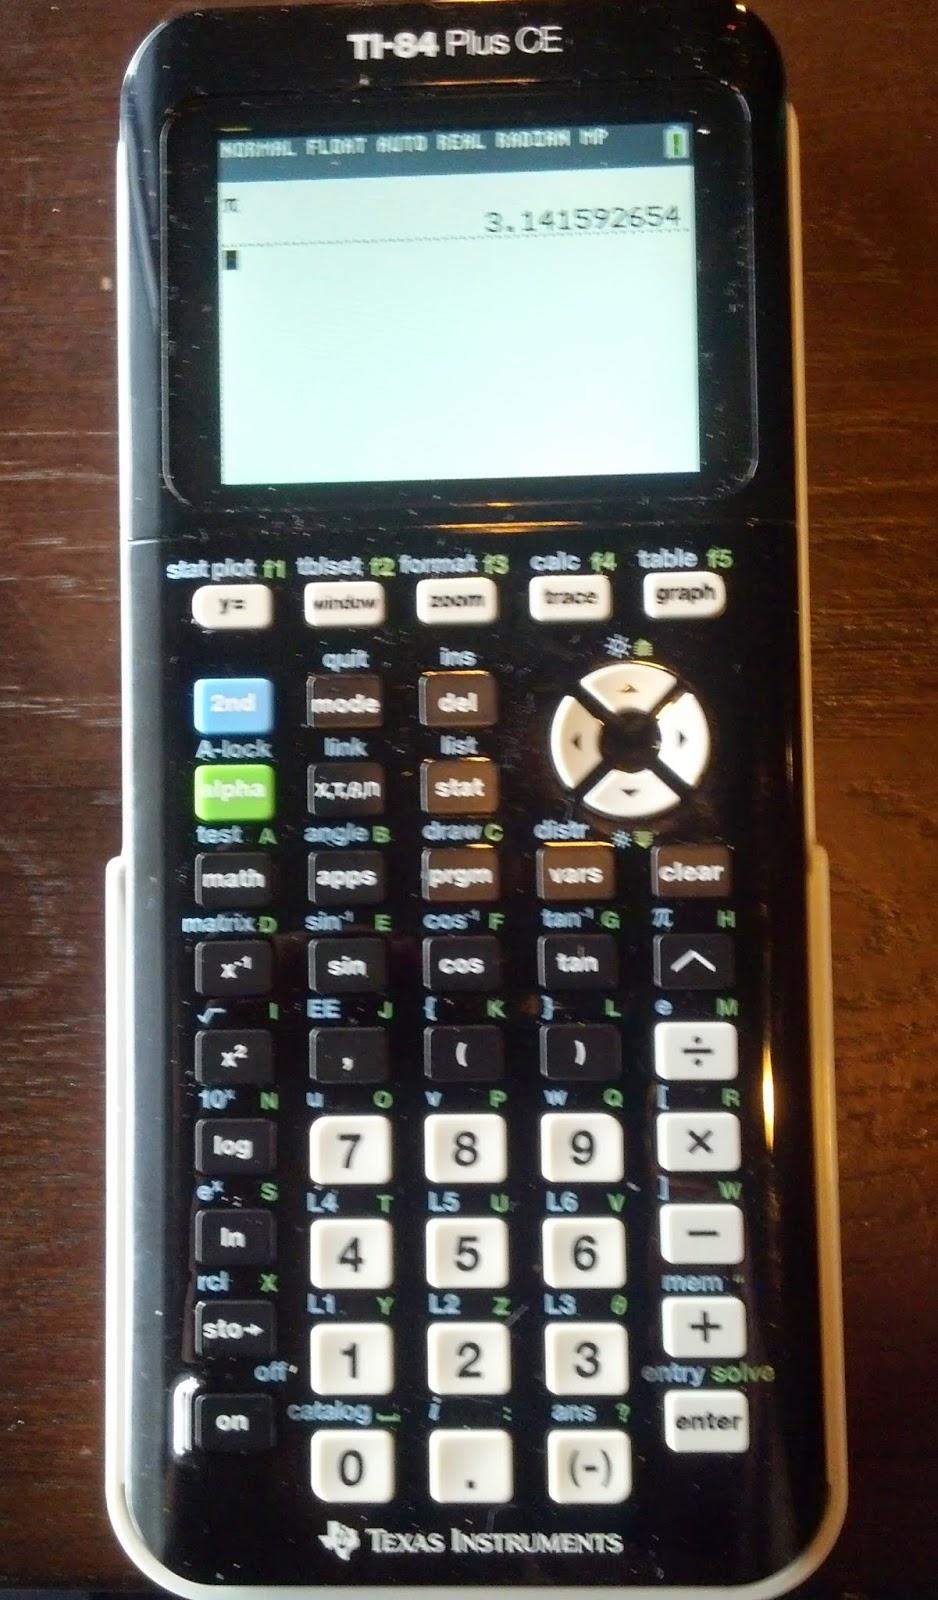 Eddies math and calculator blog review ti 84 plus ce review ti 84 plus ce urtaz Images